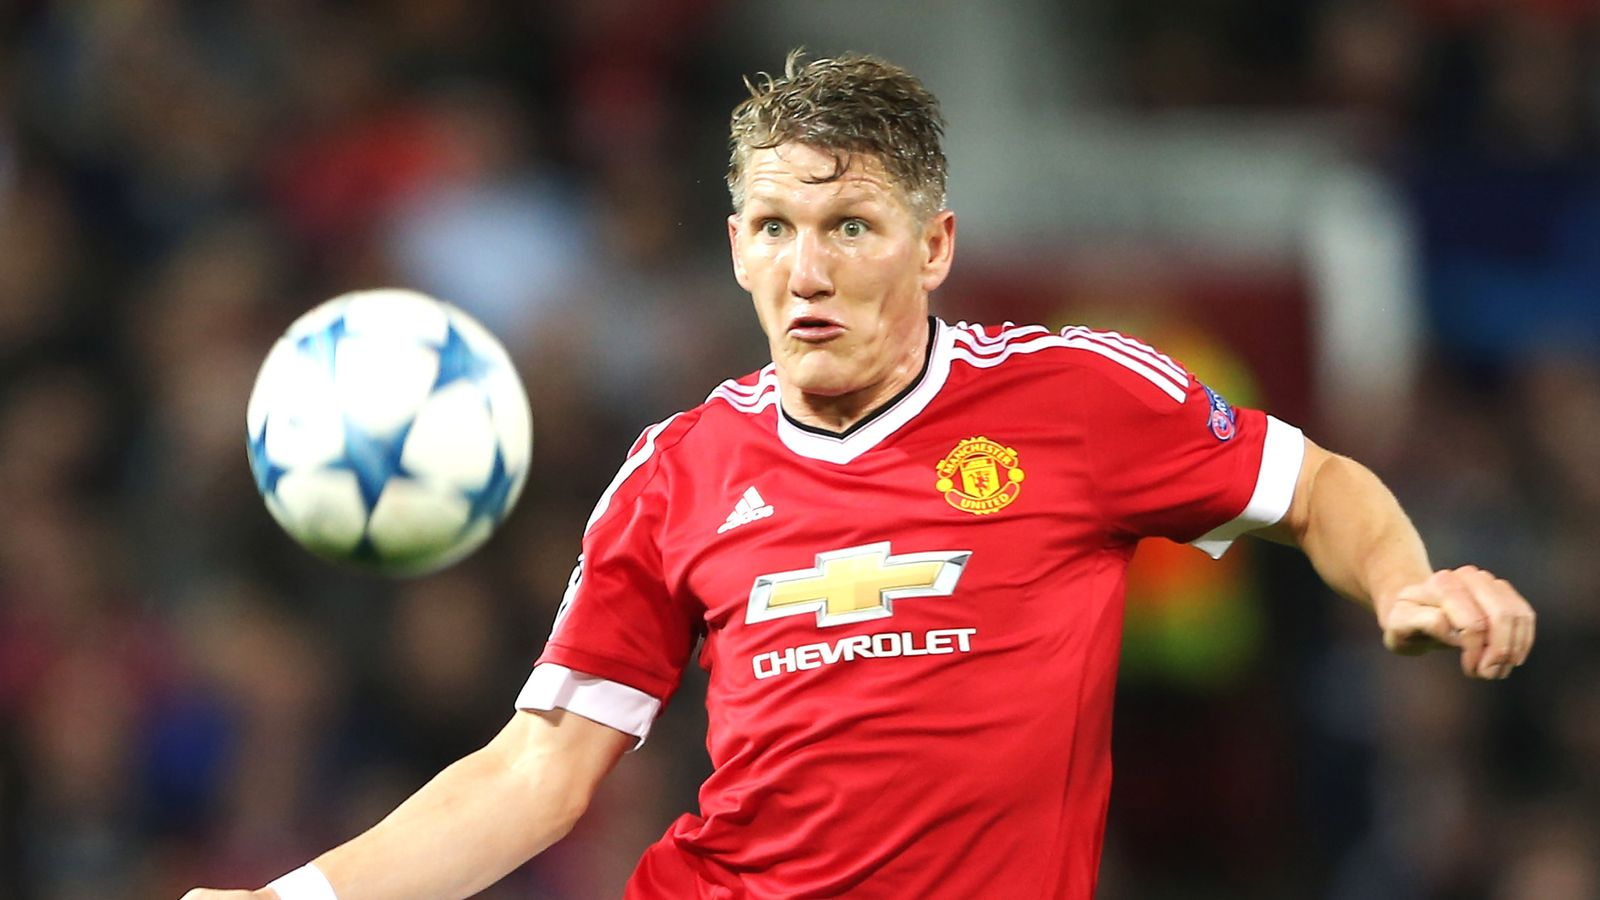 Bastian Schweinsteiger I Won T Leave Manchester United For